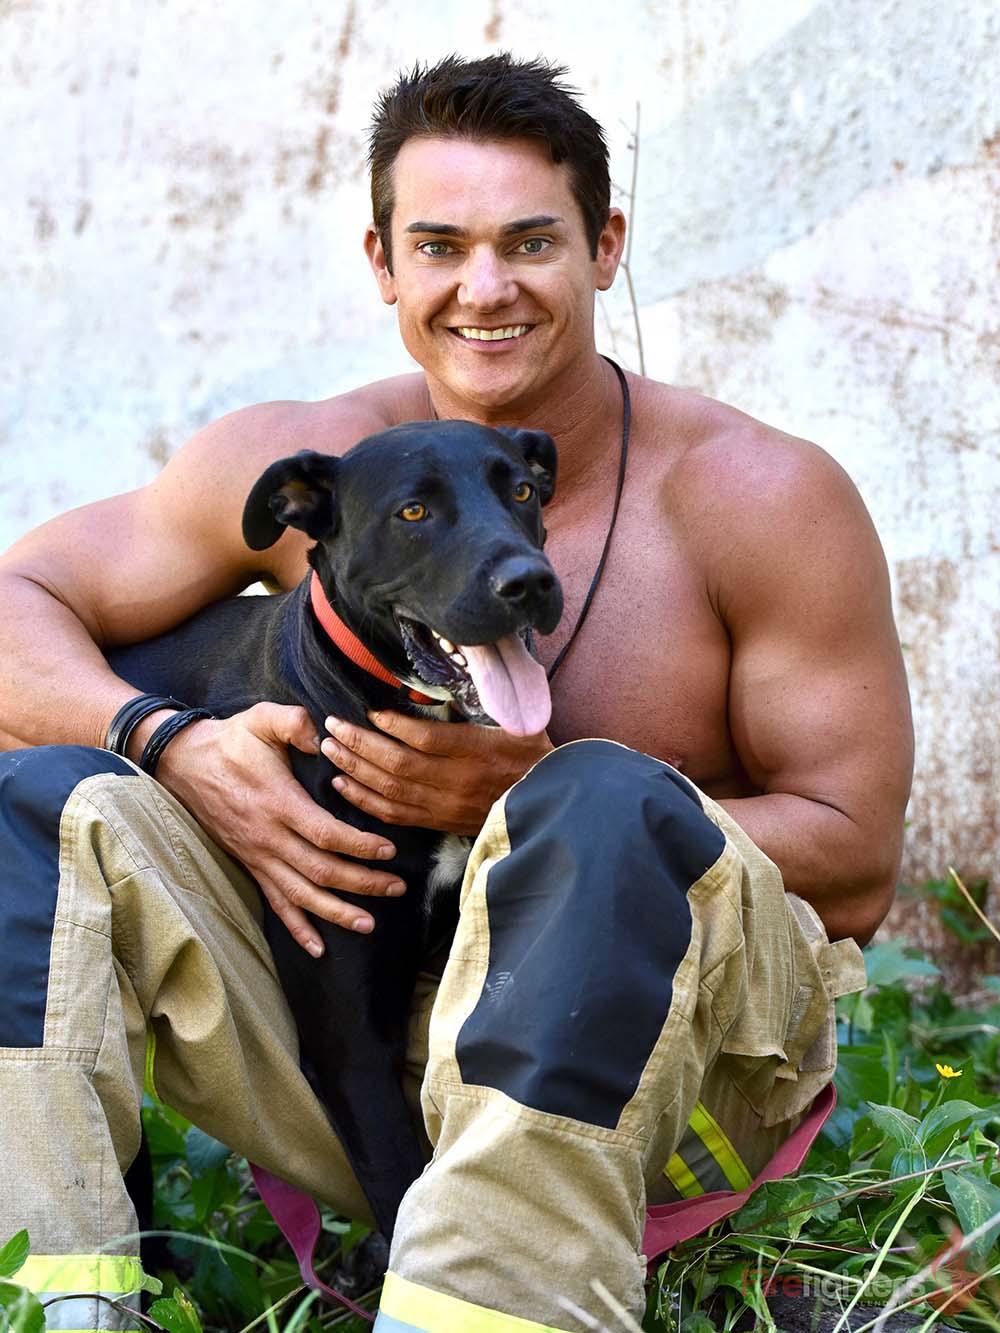 bomberos australianos calendario 2019 - 14